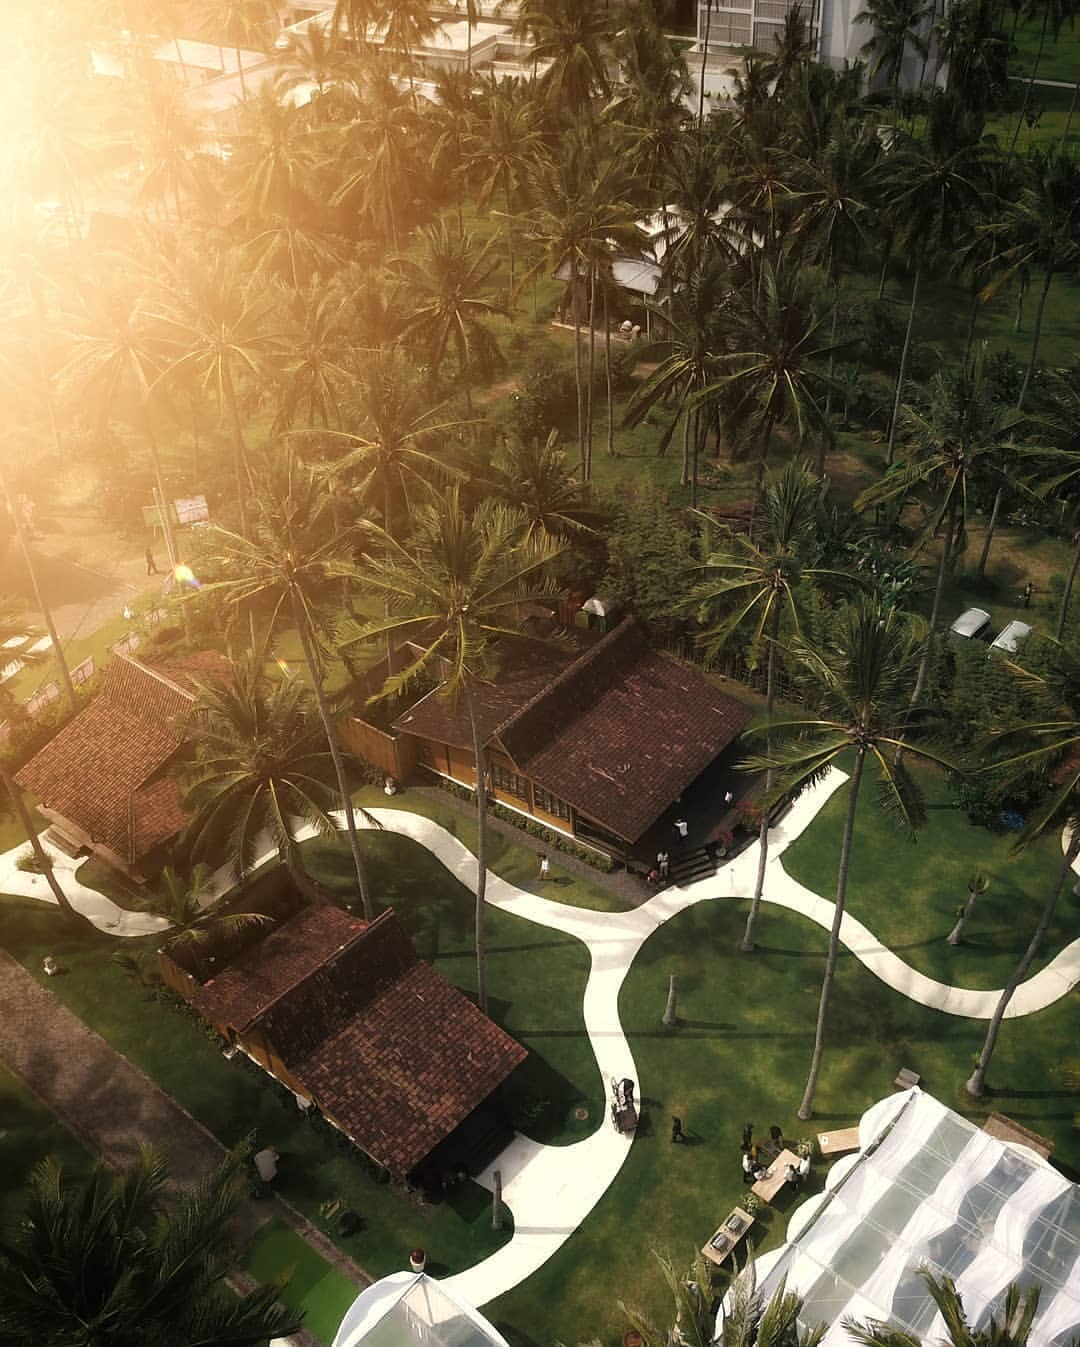 Villa So Long Dilihat Dari Atas Image From @ronnievvo